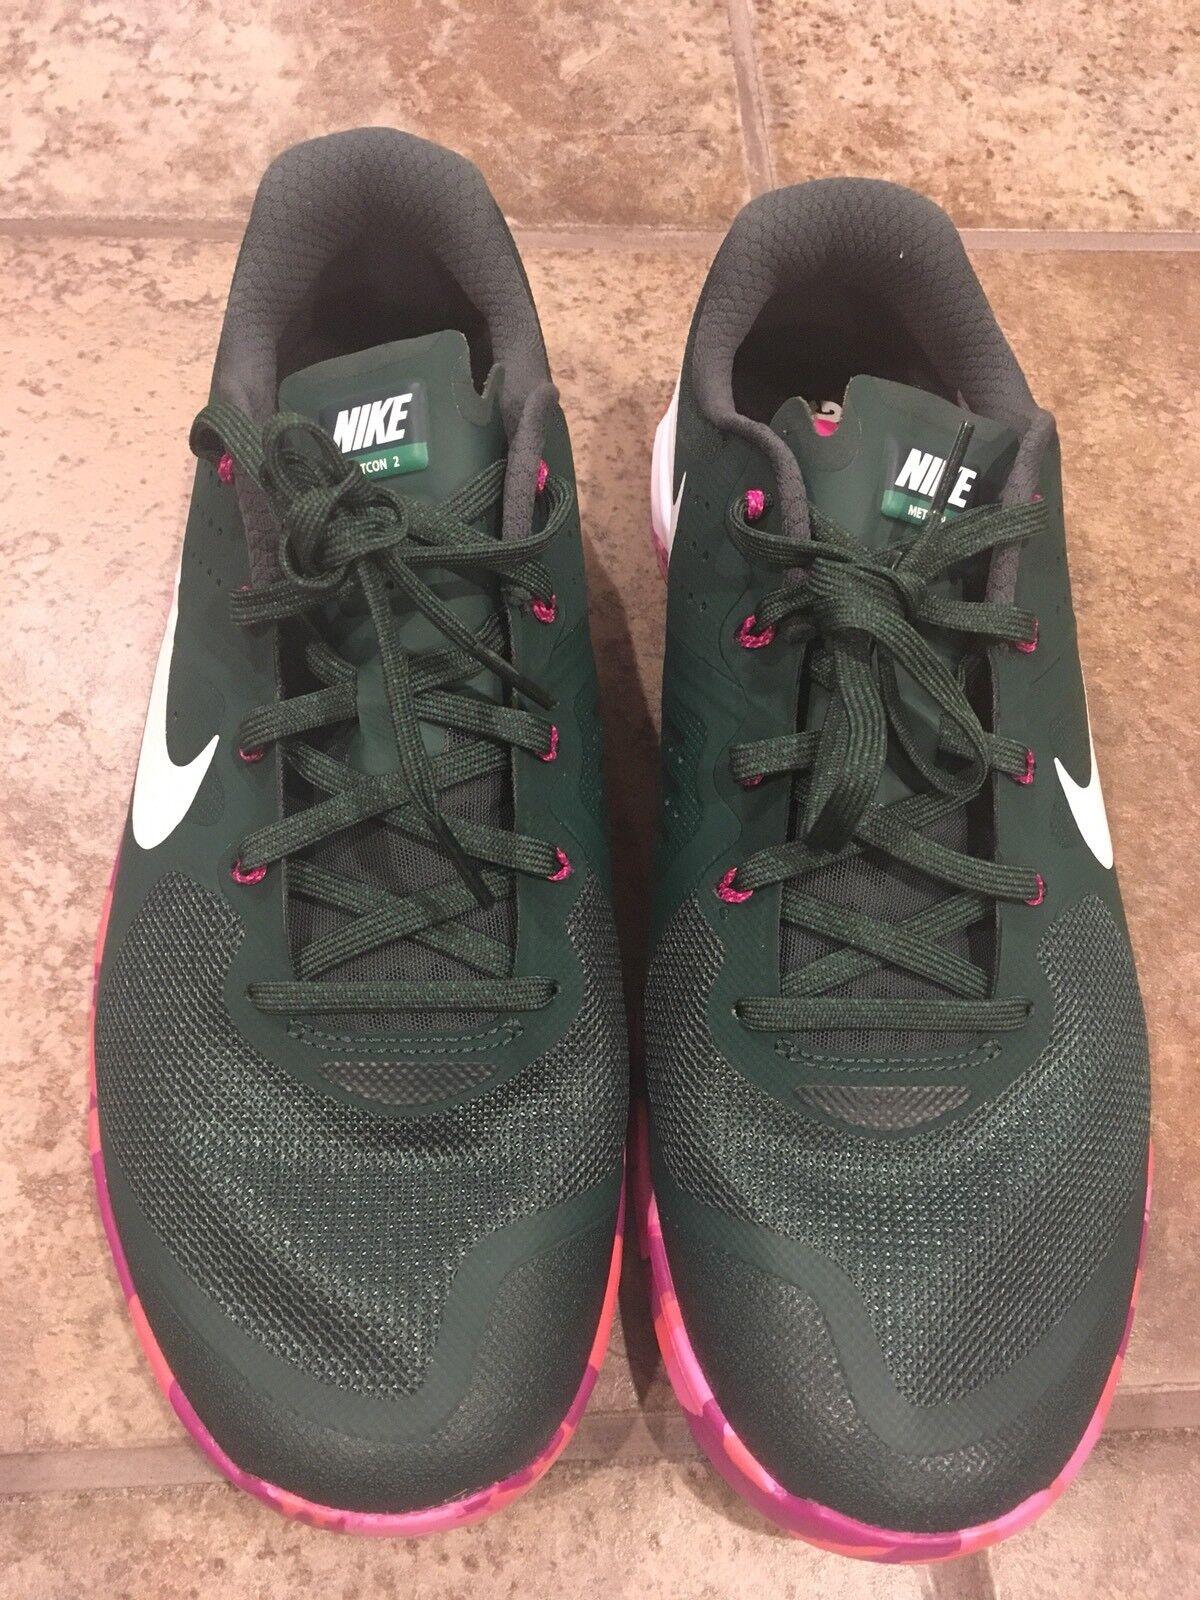 Nike metcon 2 amp pino verde scarpa (819902-315 sz 11)